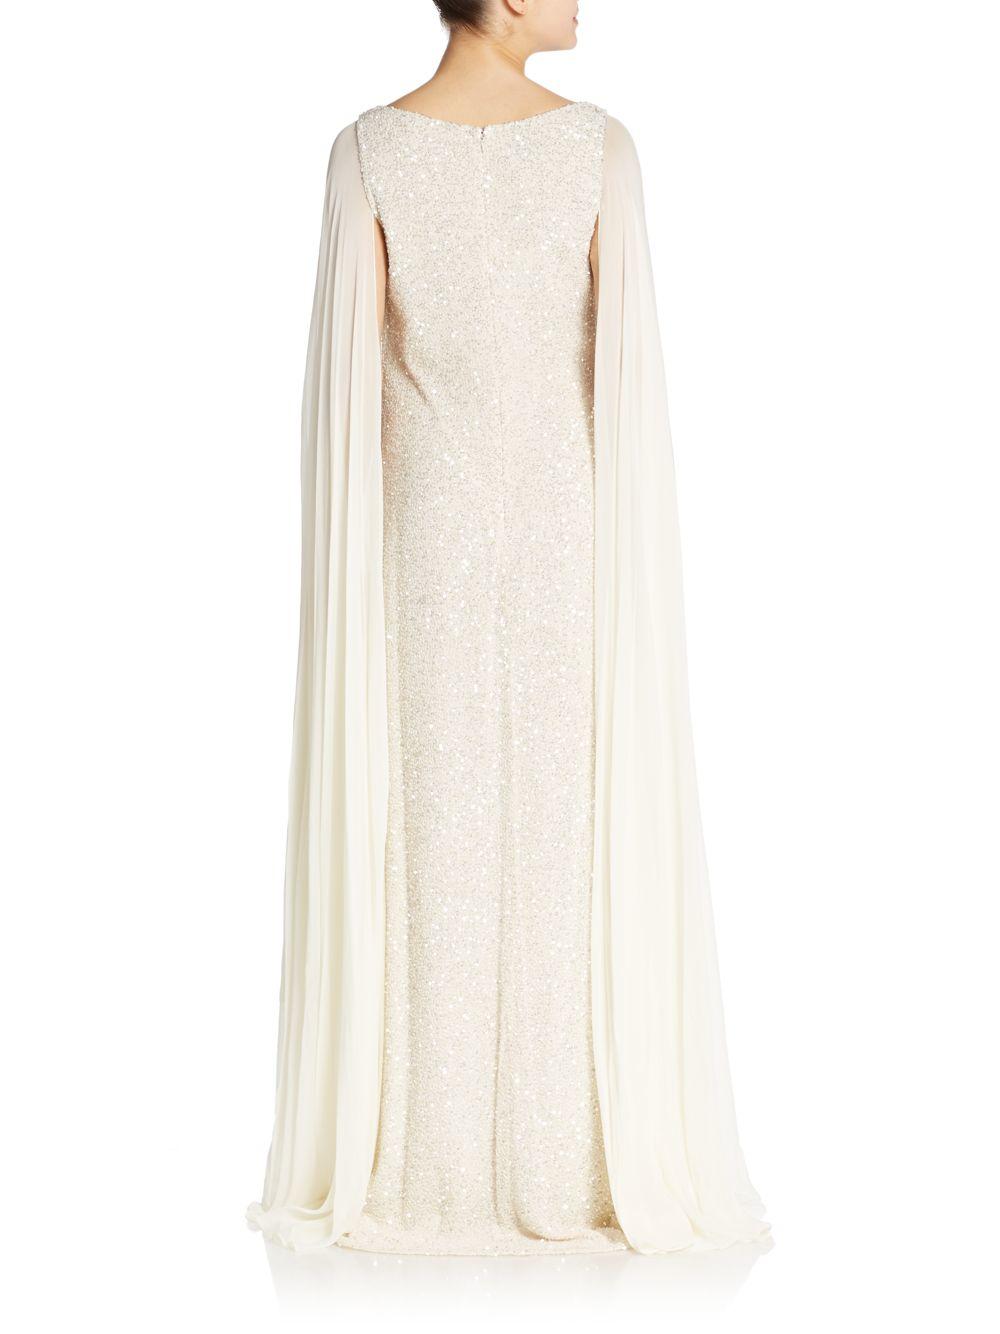 Rickie Freeman Teri Jon Dresses – fashion dresses